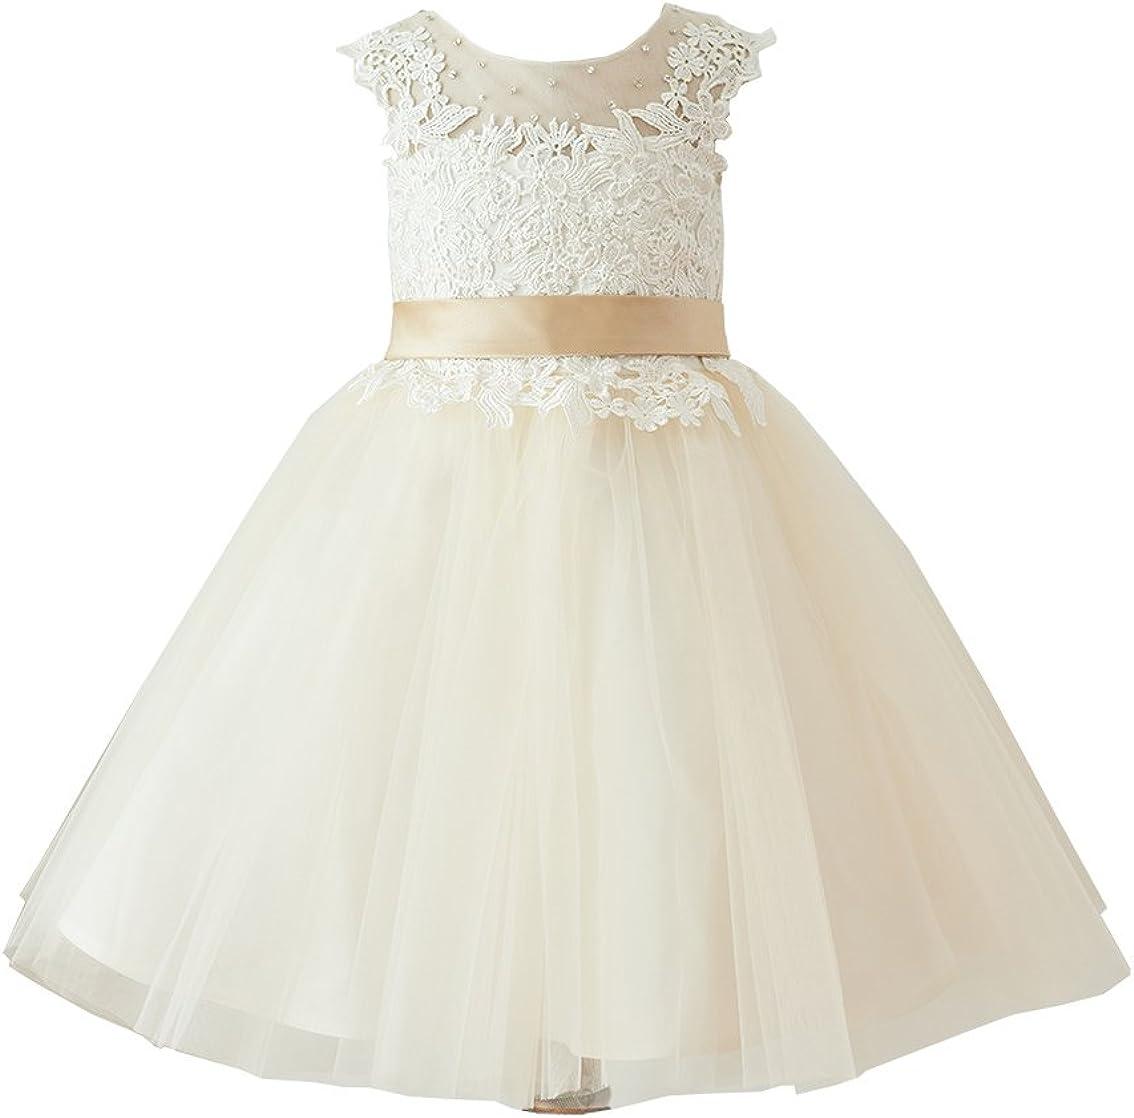 Miama Ivory Lace Champagne Tulle Keyhole Back Wedding Flower Girl Dress Junior Bridesmaid Dress